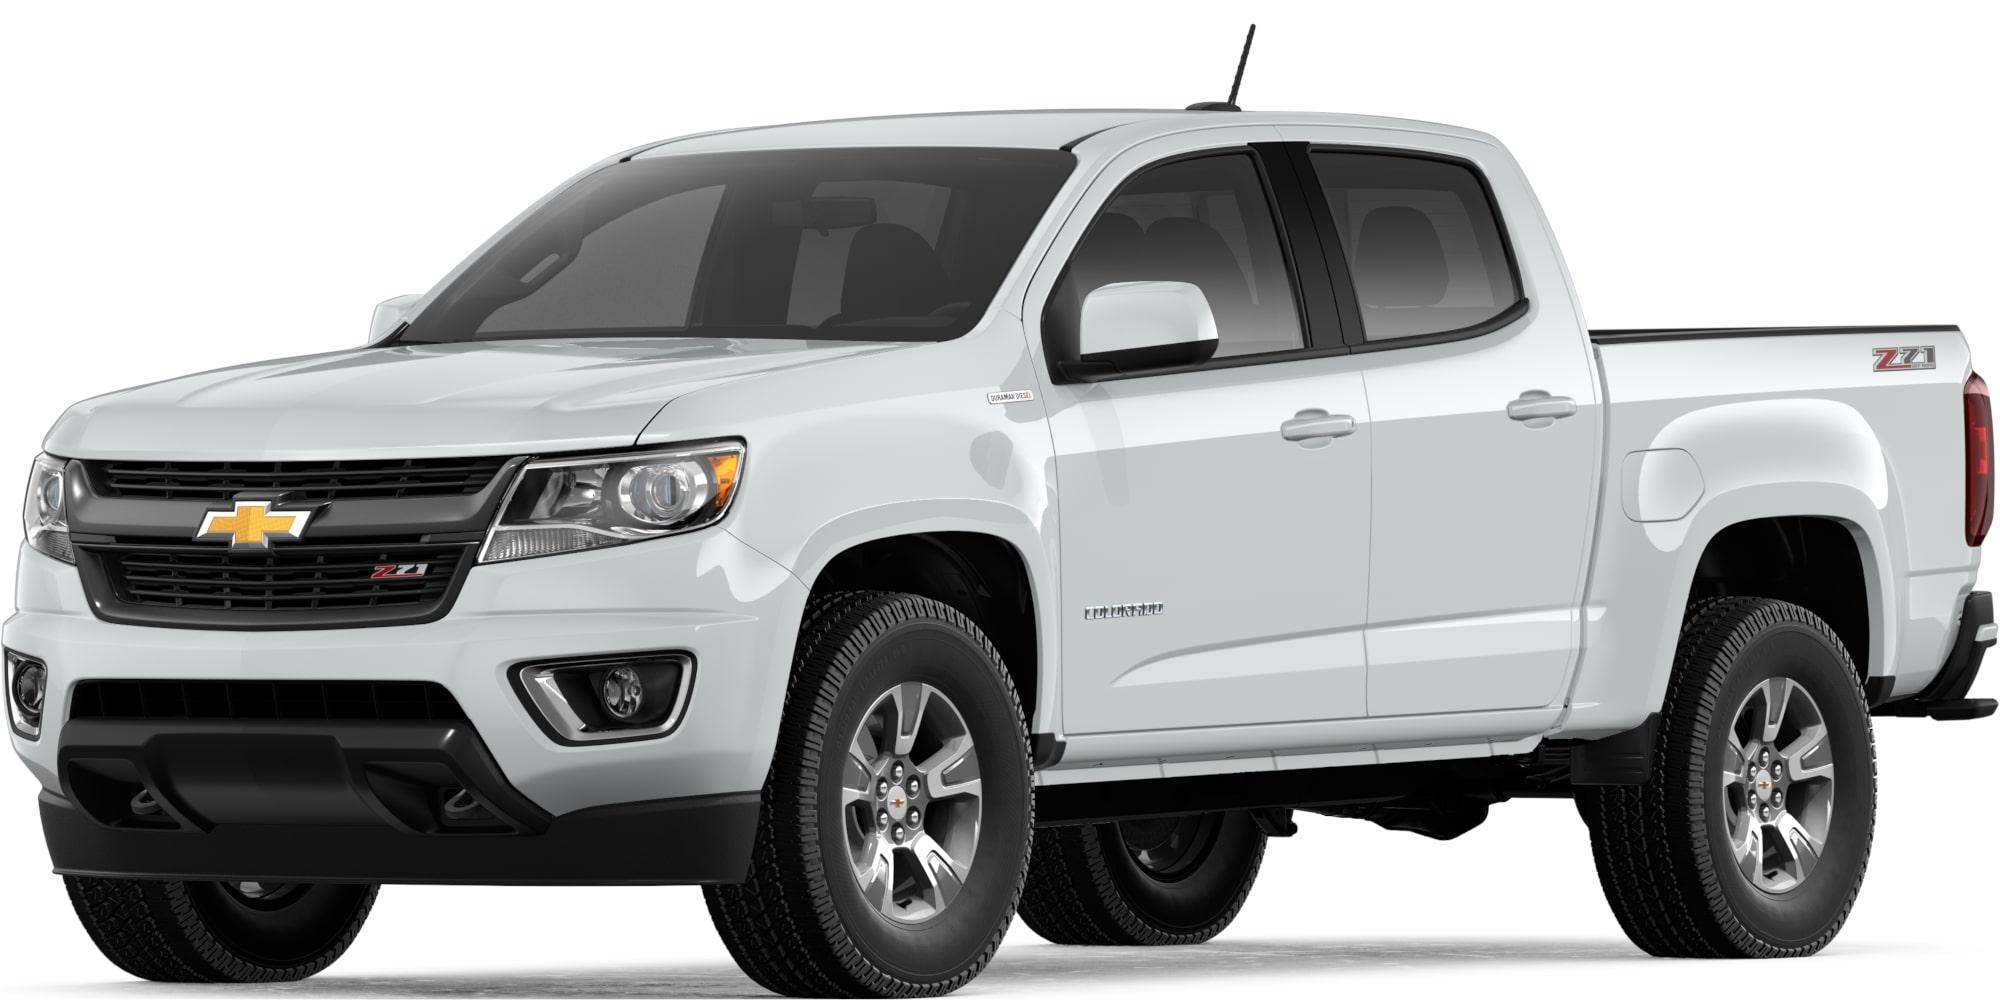 2019 colorado mid size truck diesel truck Blue Chevy Colorado summit white